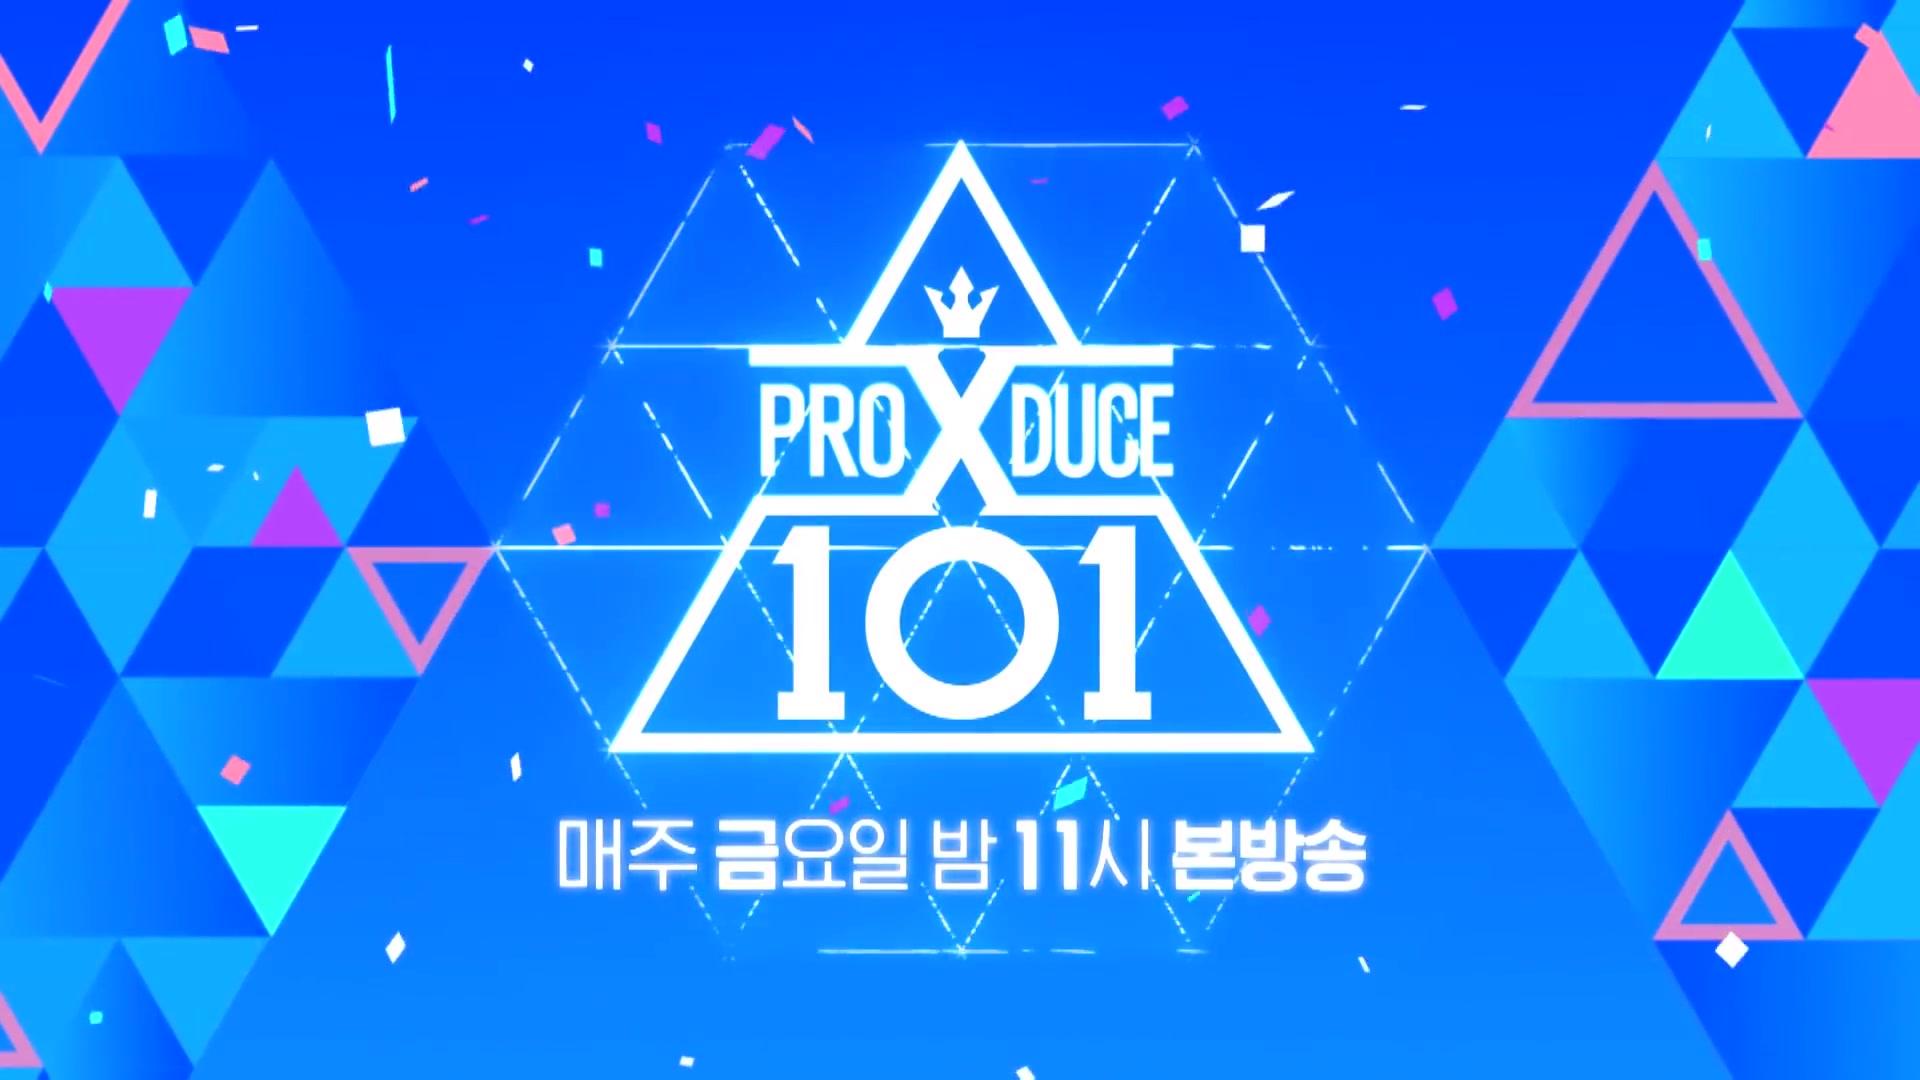 【PRODUCE X 101】pd404 舞臺表演合集(含公司等級評價) - 持更(更至190719 EP.12)_嗶哩嗶哩 (゜-゜)つロ 干杯~-bilibili